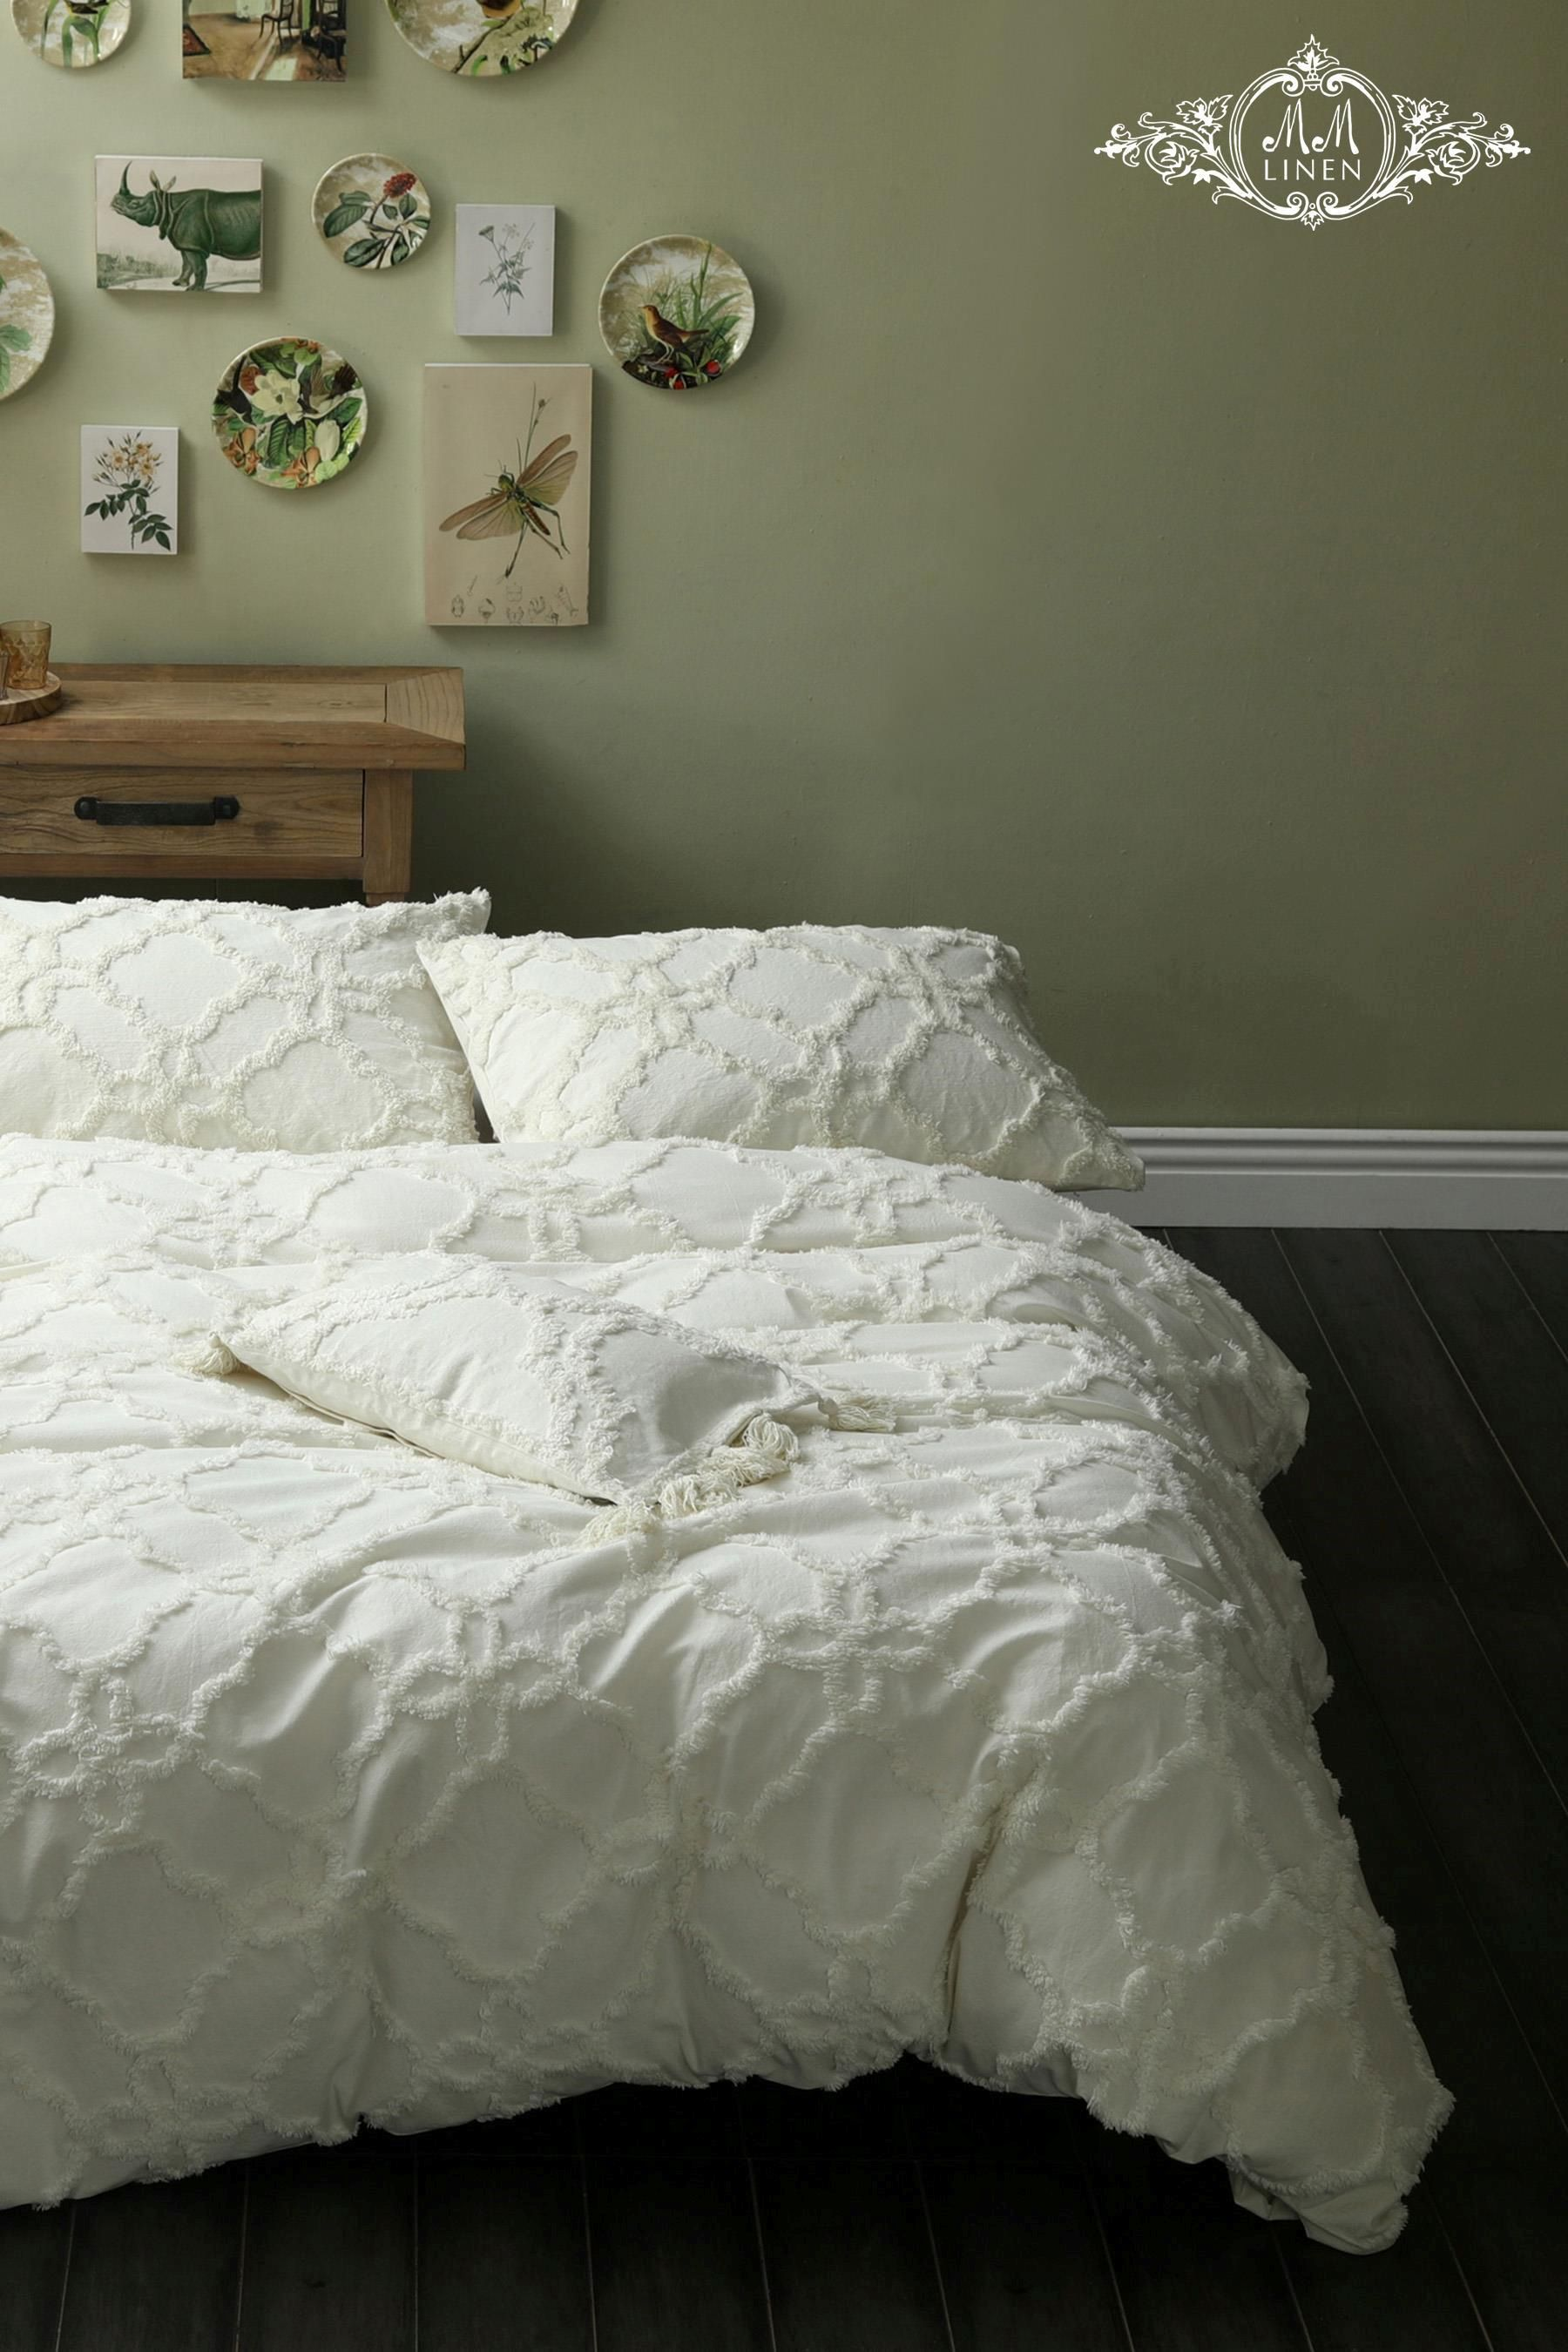 Buy mm linen clover duvet cover and pillowcase set from